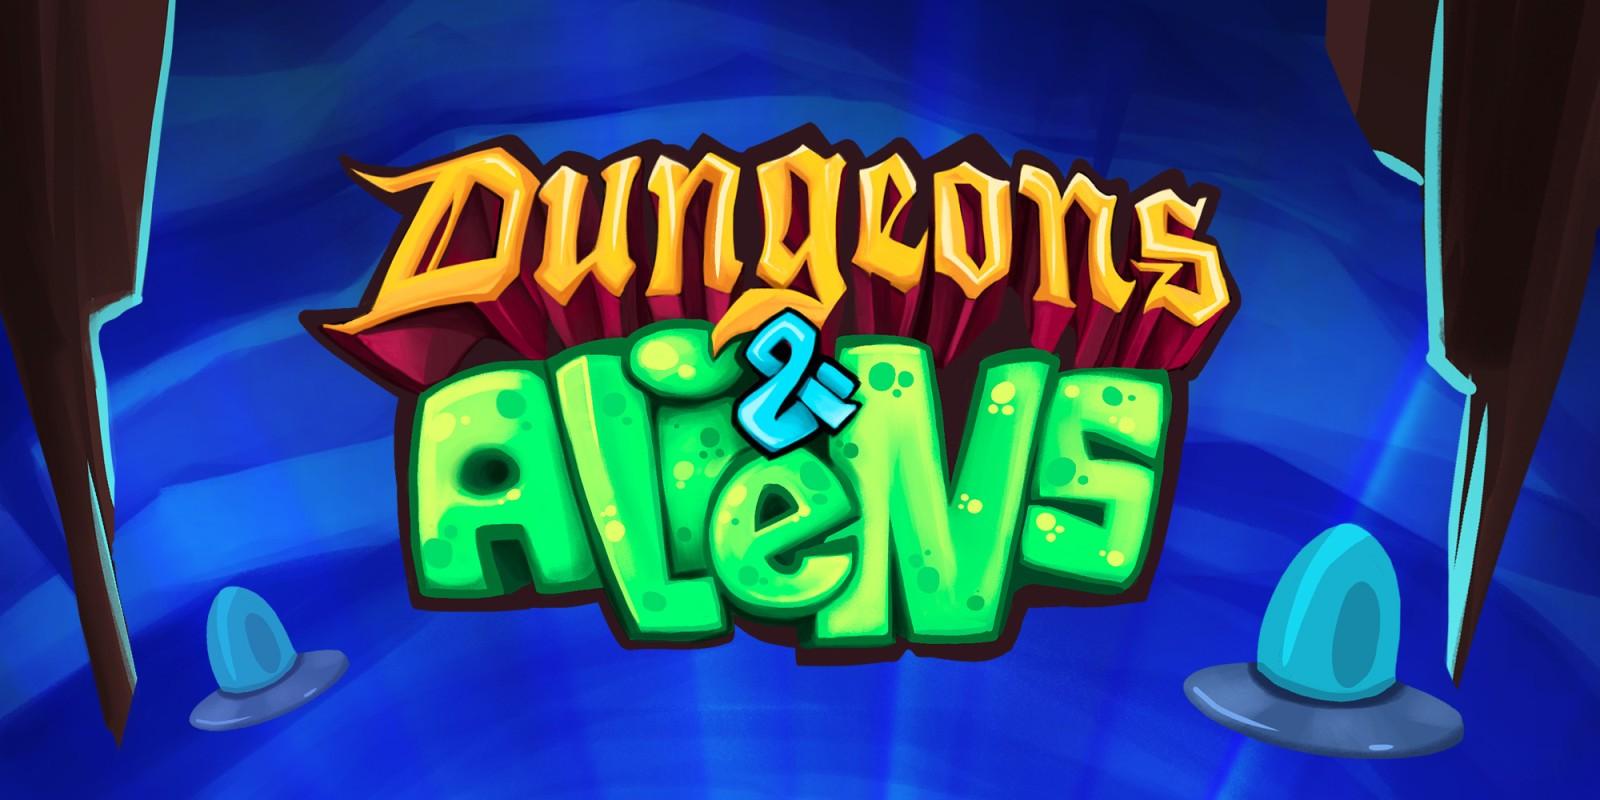 Dungeons & Aliens – Recensione